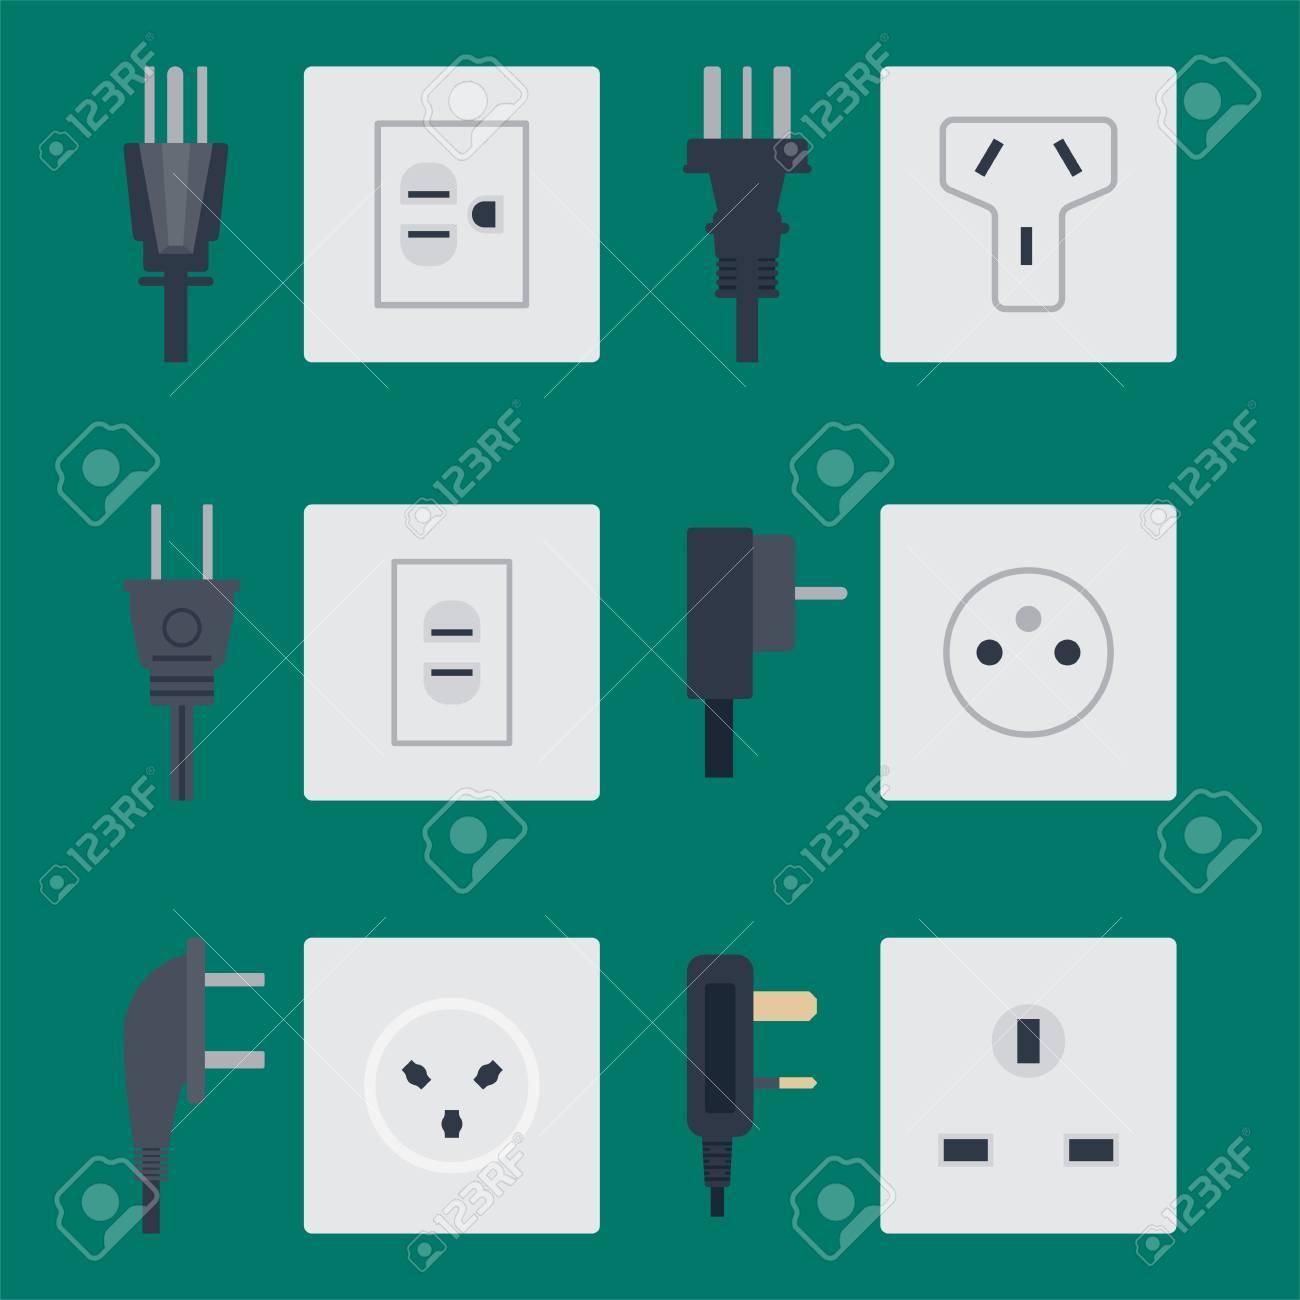 Elektrische Steckdose Vektor-Illustration Energie Steckdose ...